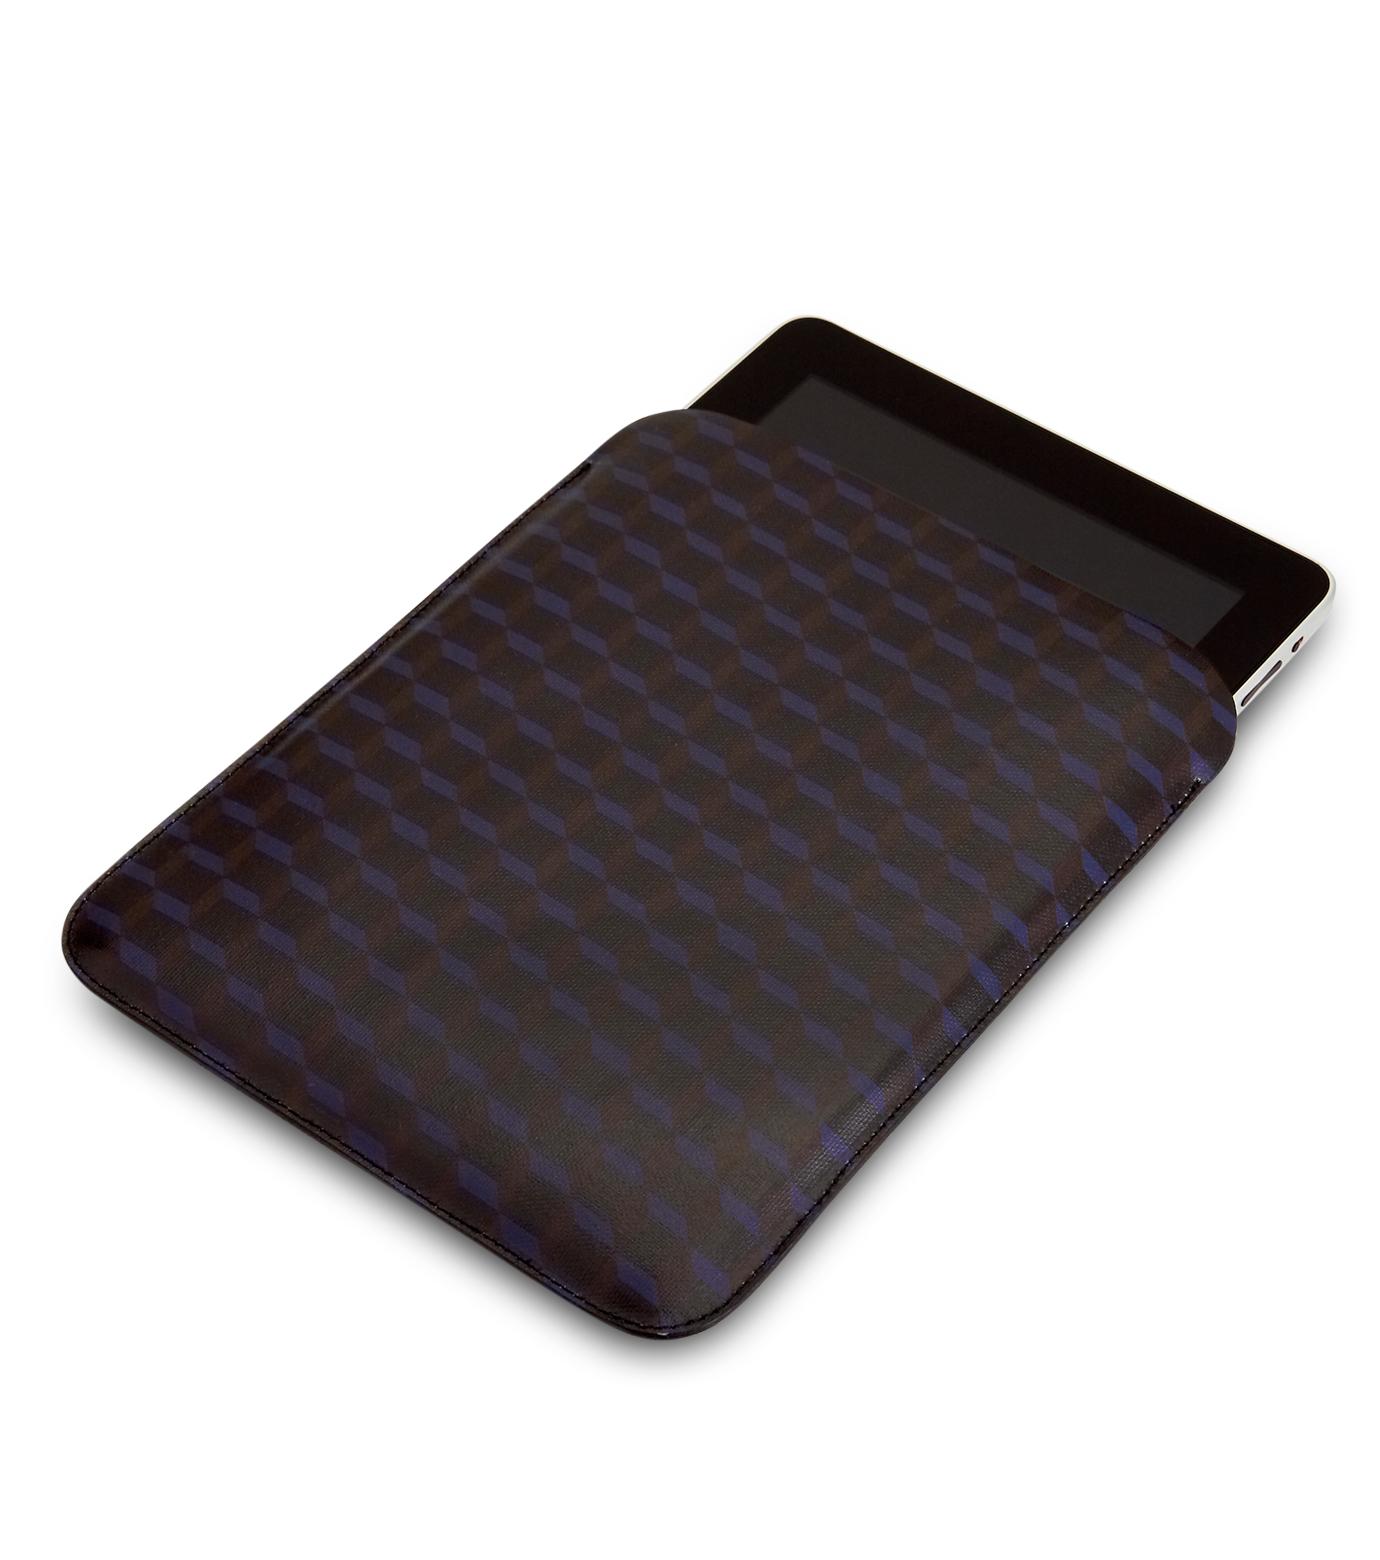 Pierre Hardy(ピエール アルディ)のI-pad case-BROWN-A1IPAD-42 拡大詳細画像3